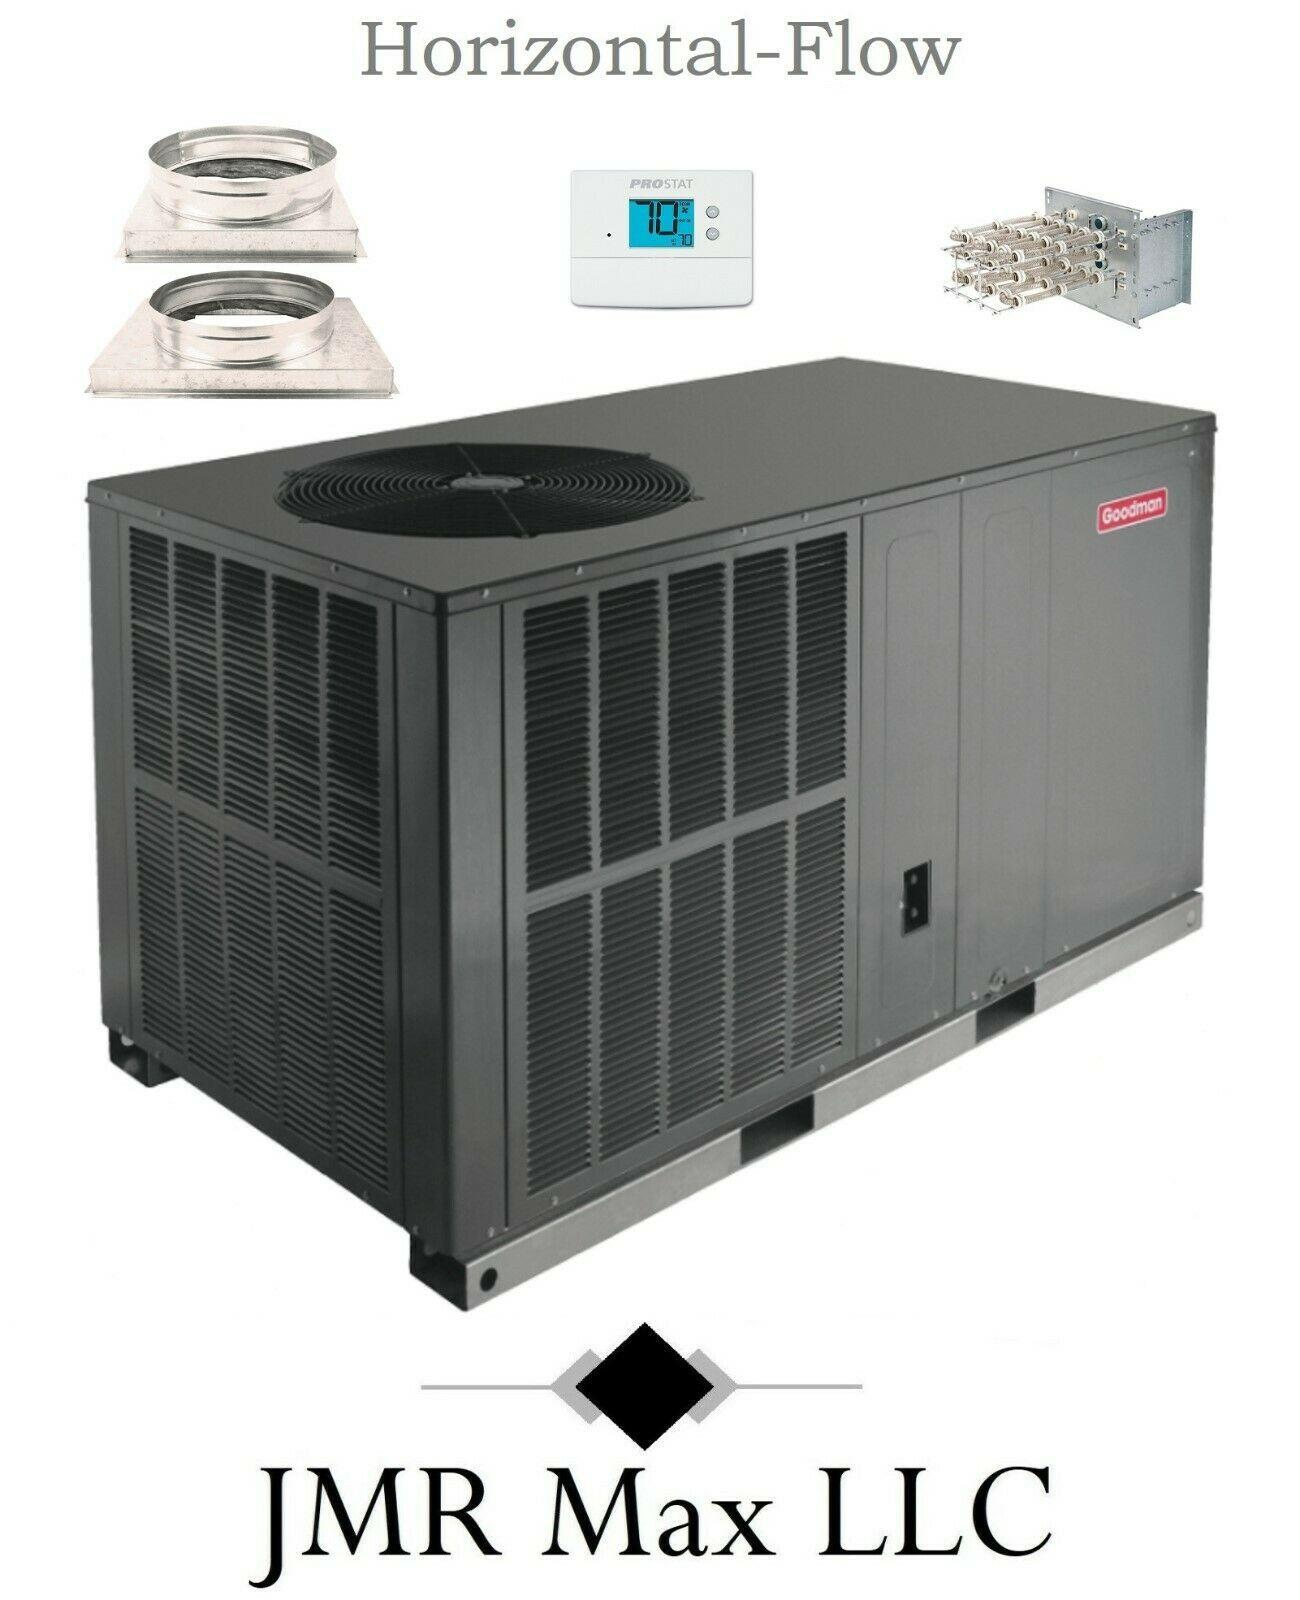 3 Ton Air Conditioner in 2020 Air conditioner